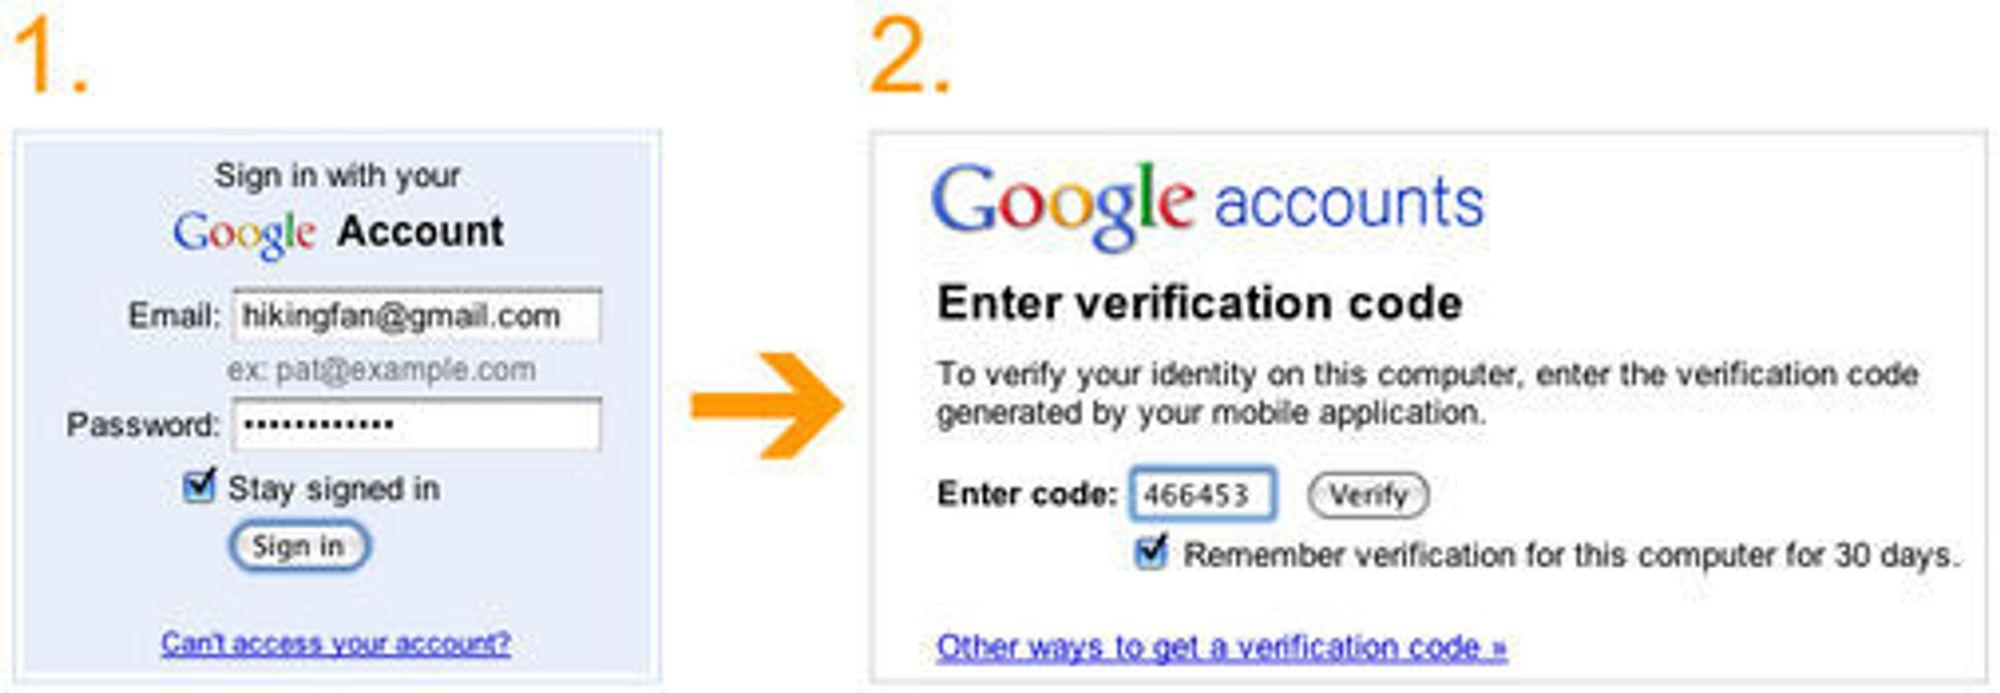 Tofaktors innlogging på Google-kontoer.